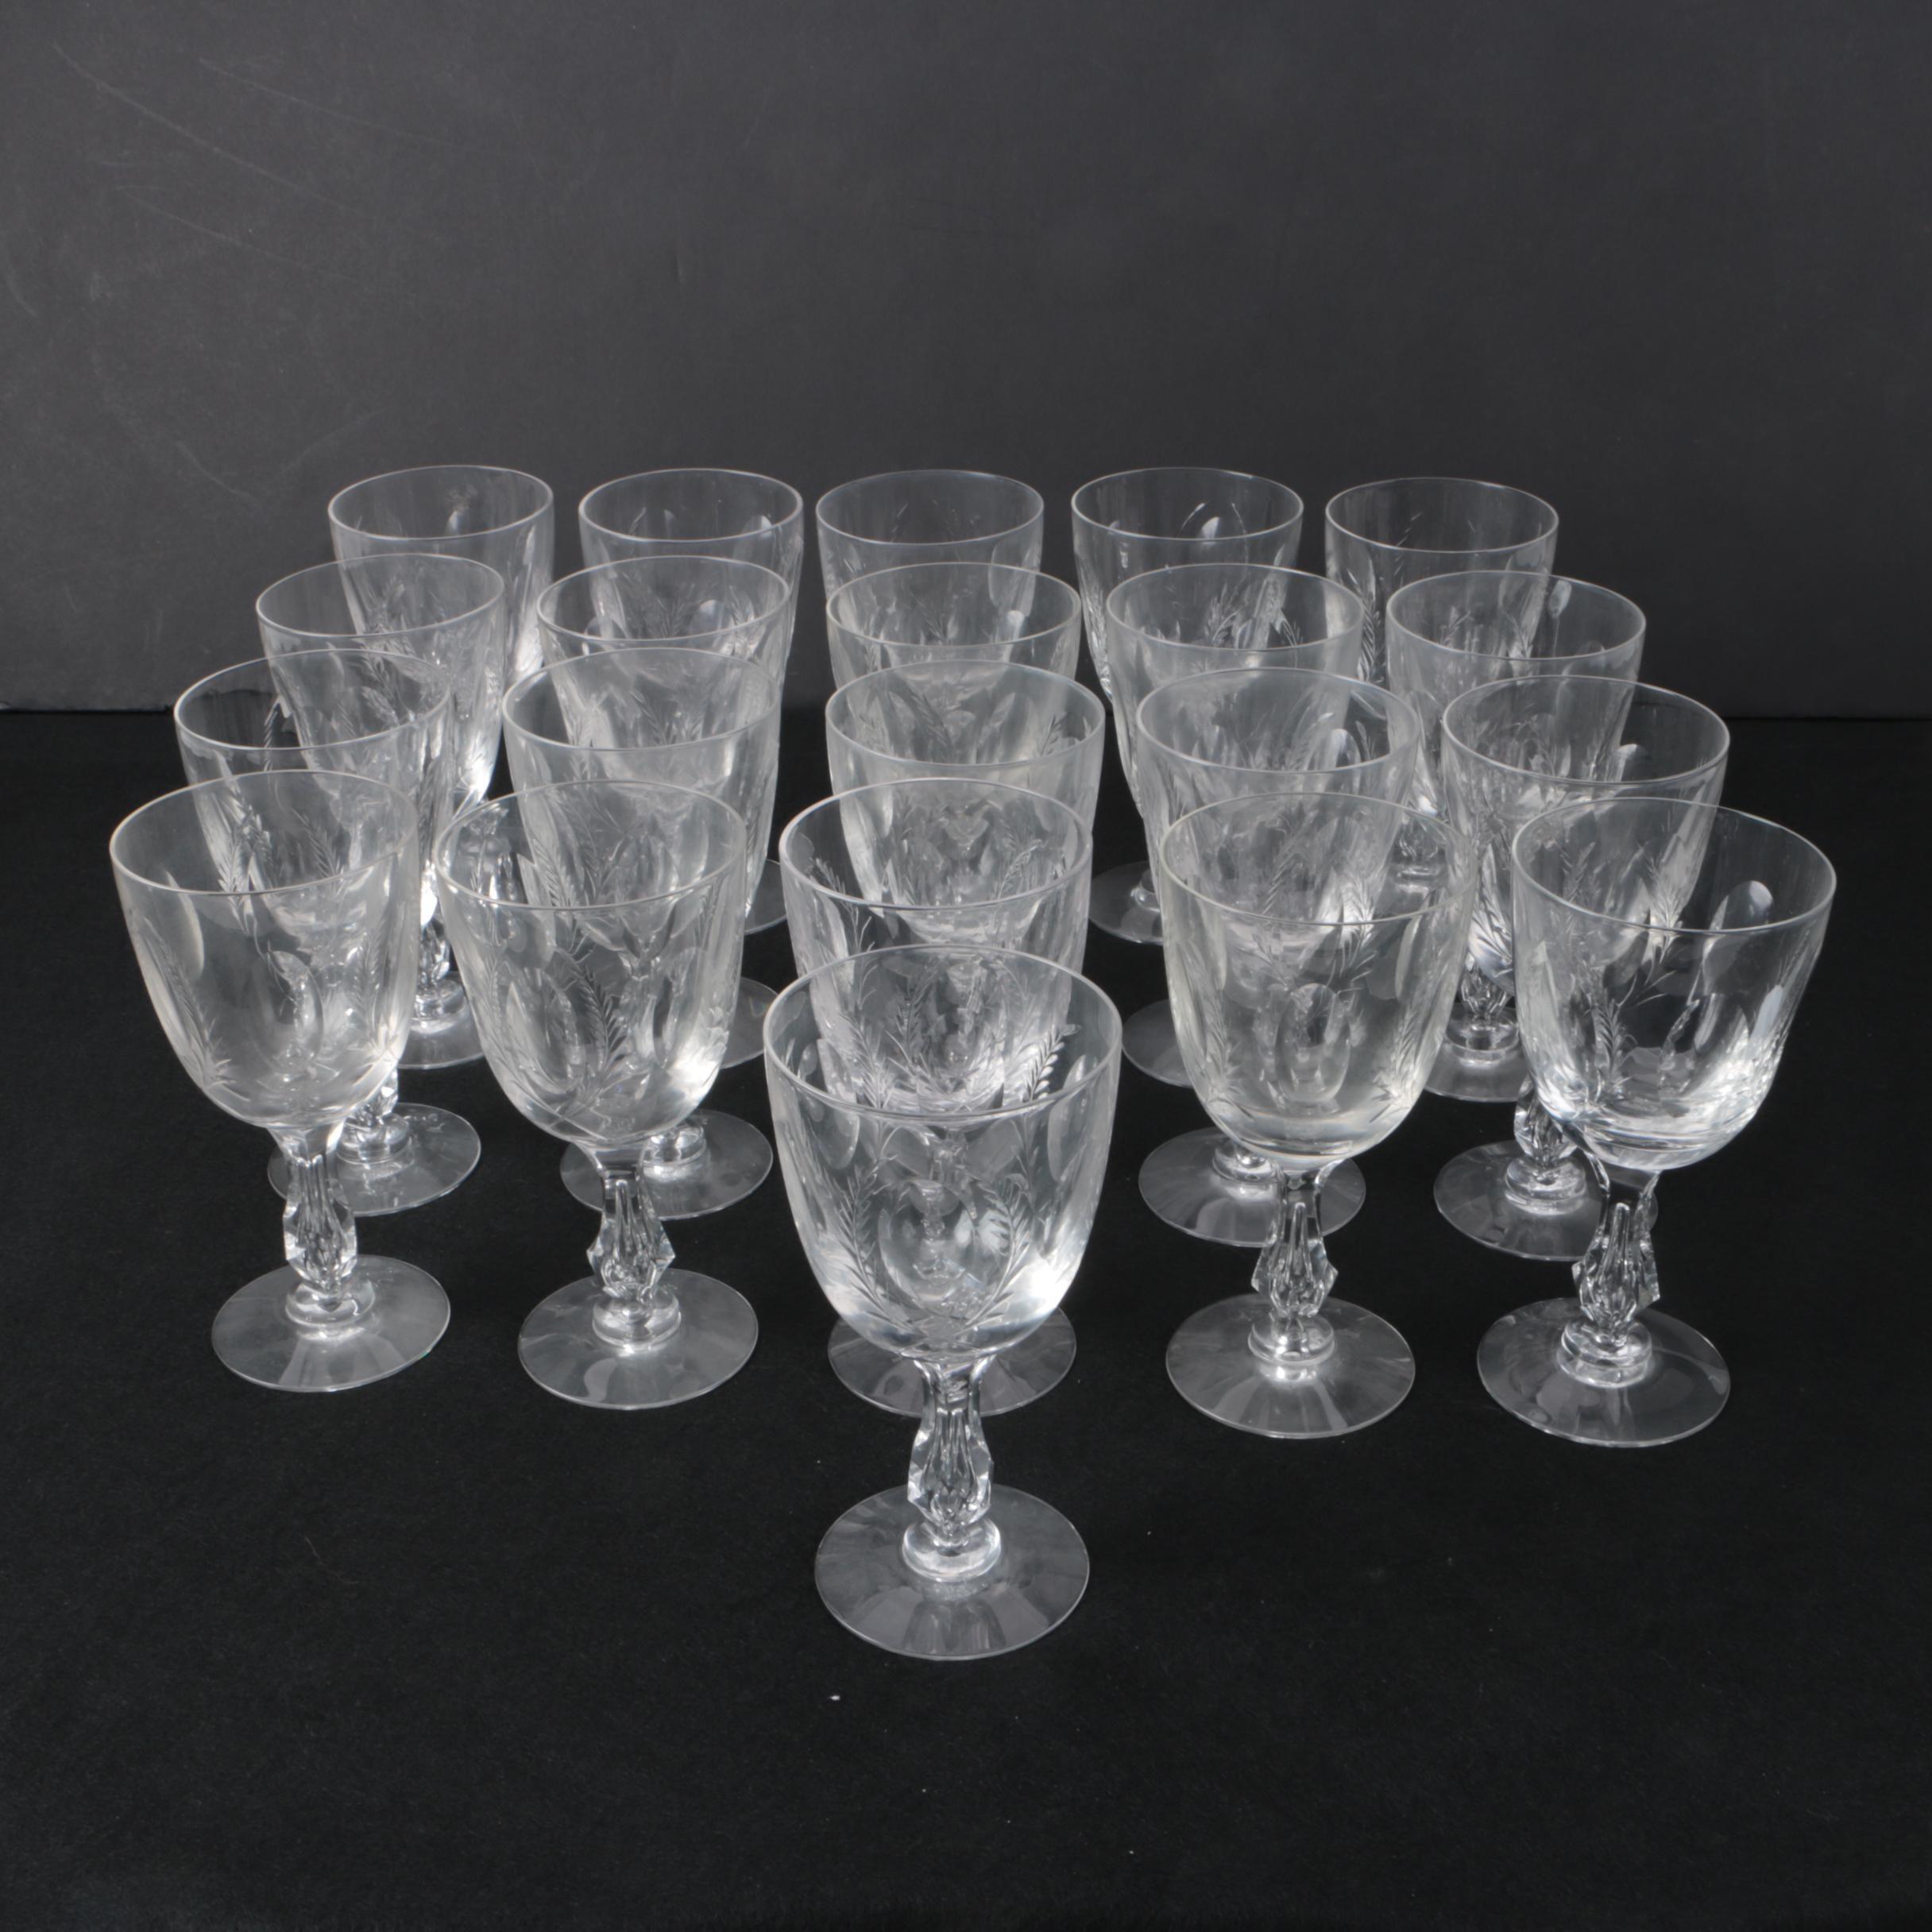 Vintage Laurel Wreath Etched Wine Glasses